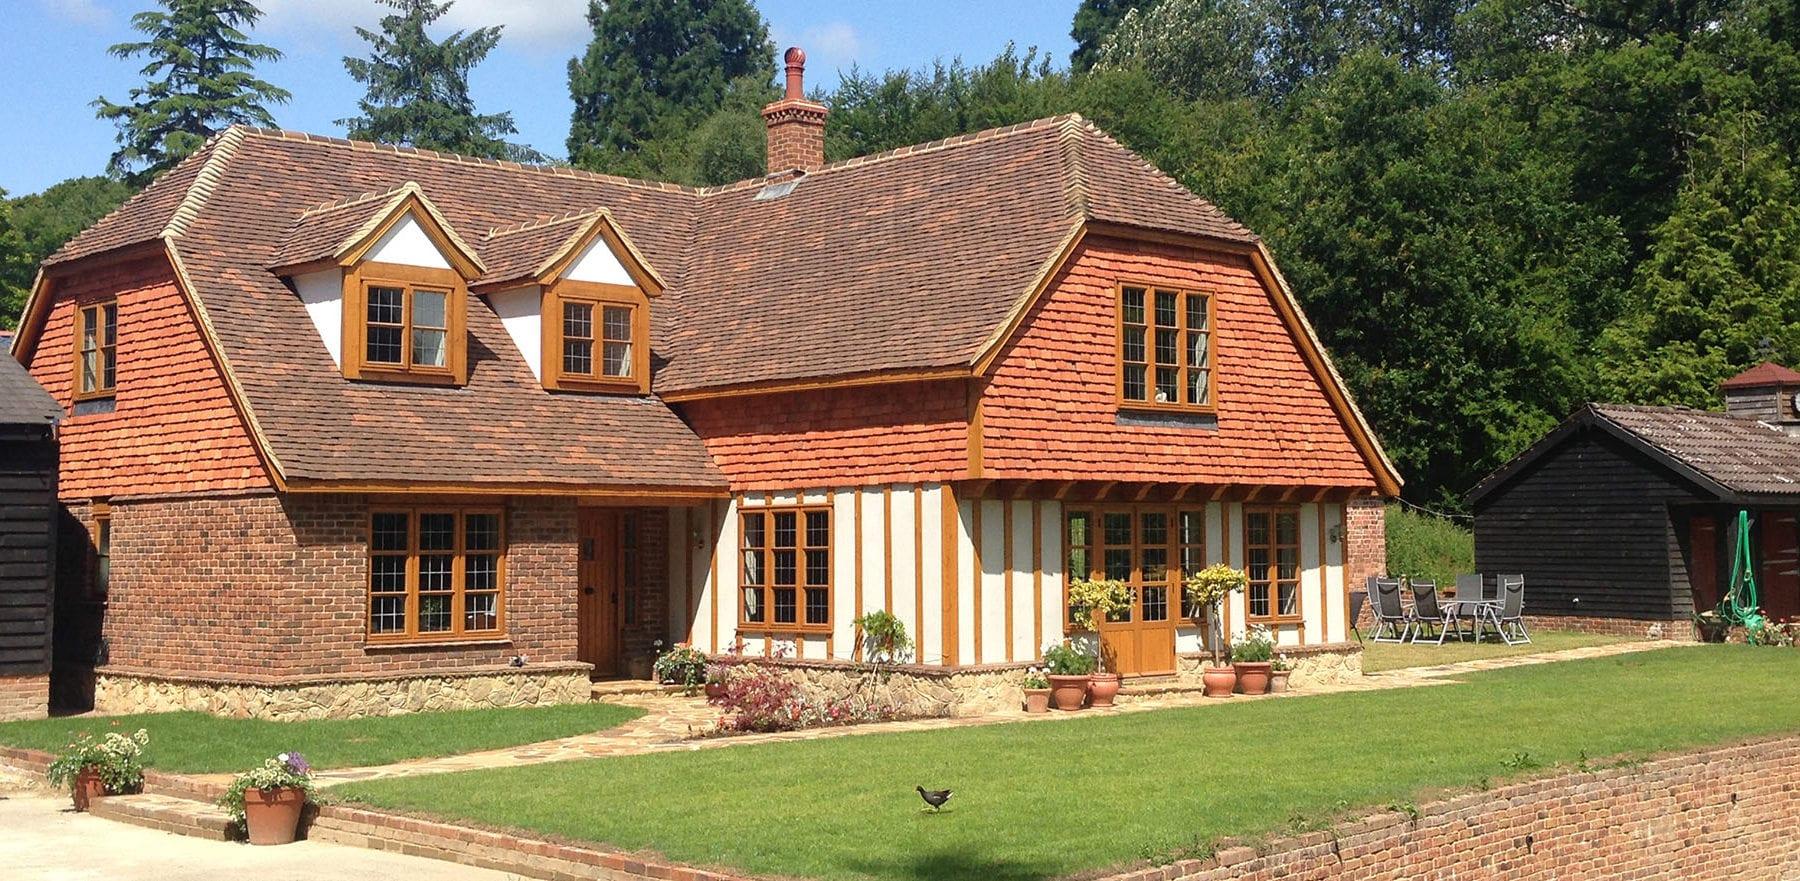 Lifestiles - Handmade Bespoke Clay Roof Tiles - Rotherfield, England 2